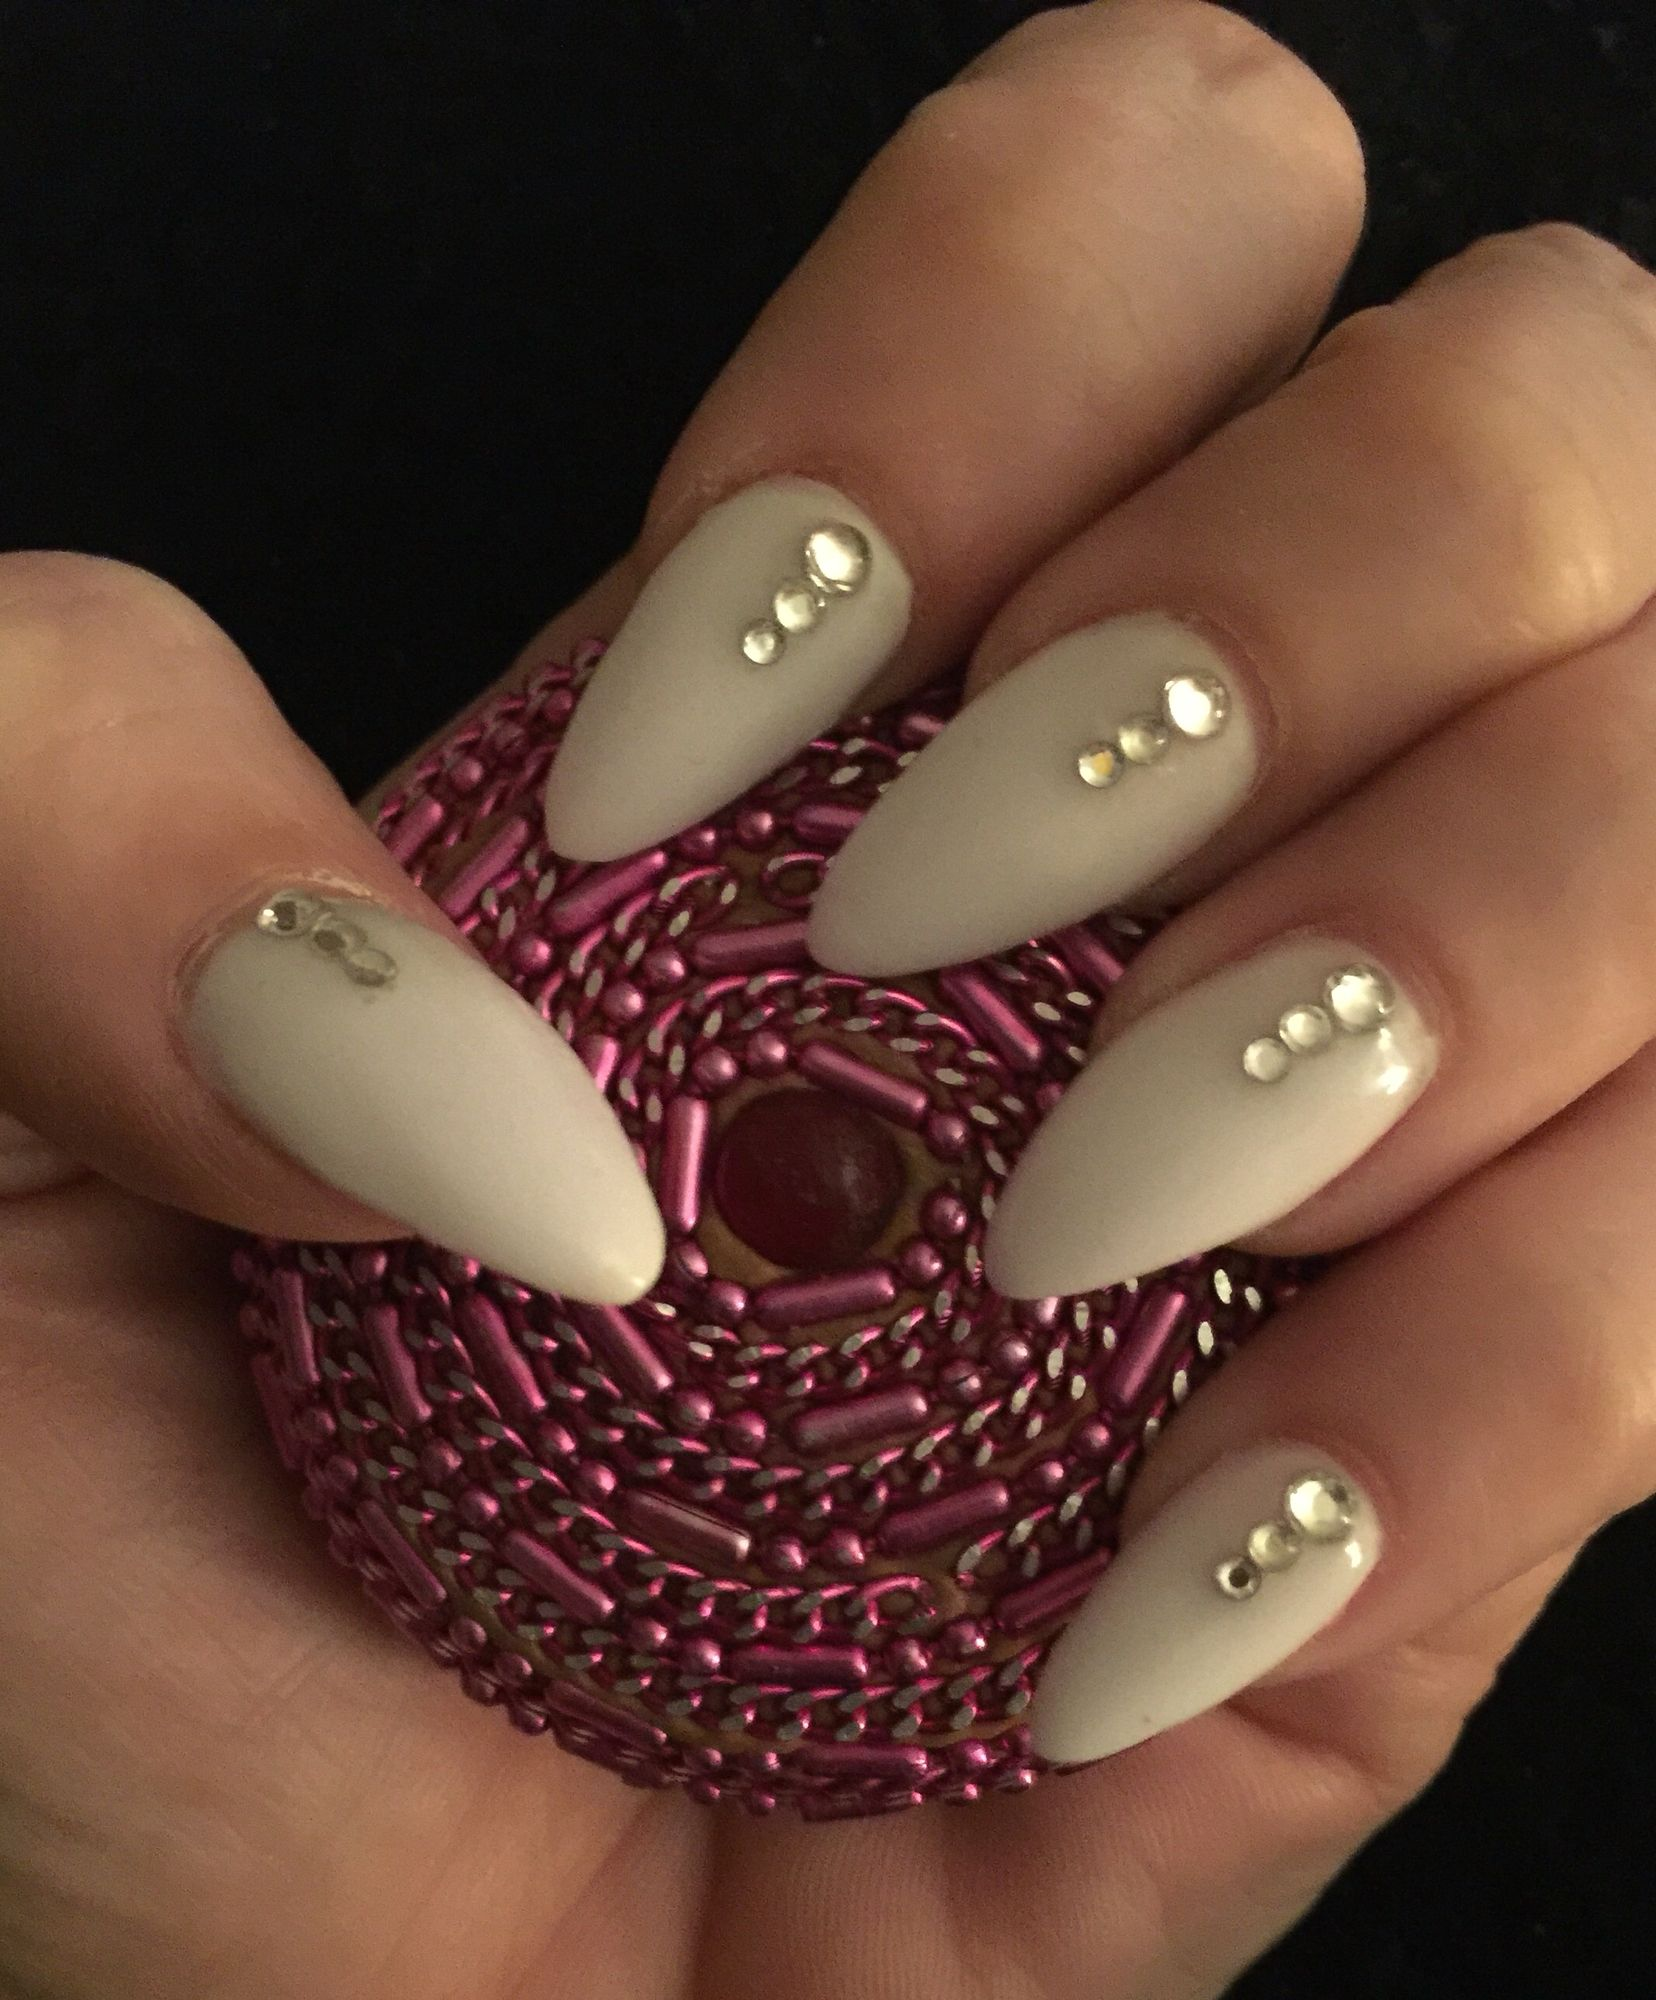 Elegant Stiletto Nail Art: White Stiletto Nails With Rhinestones.